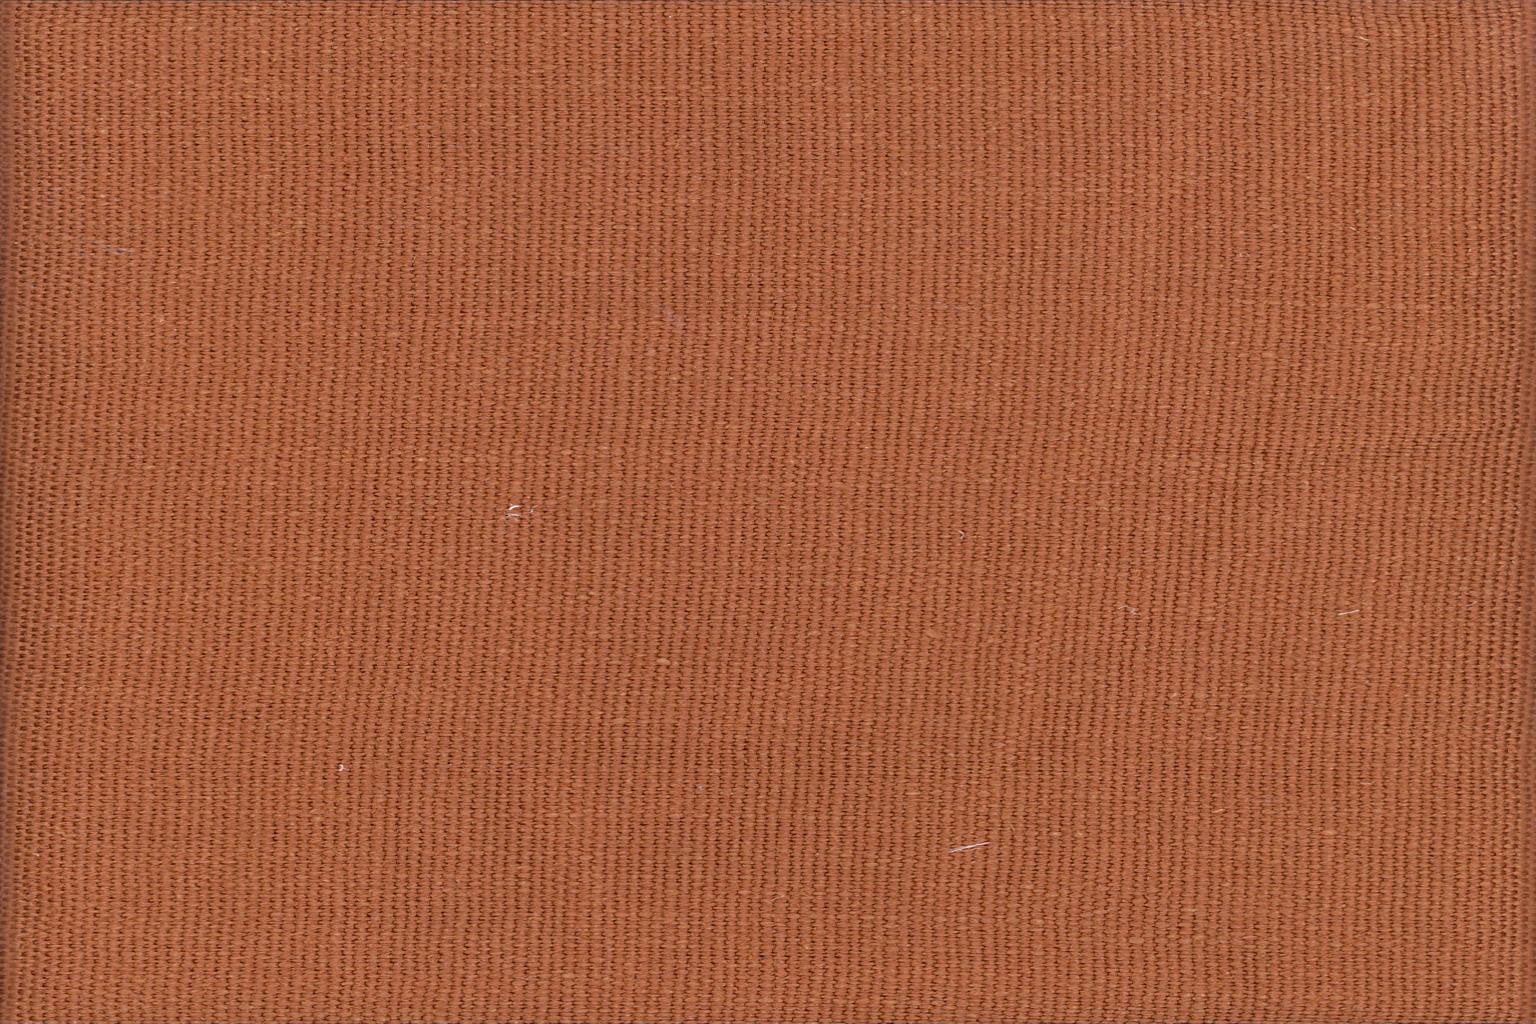 SIENA Leather